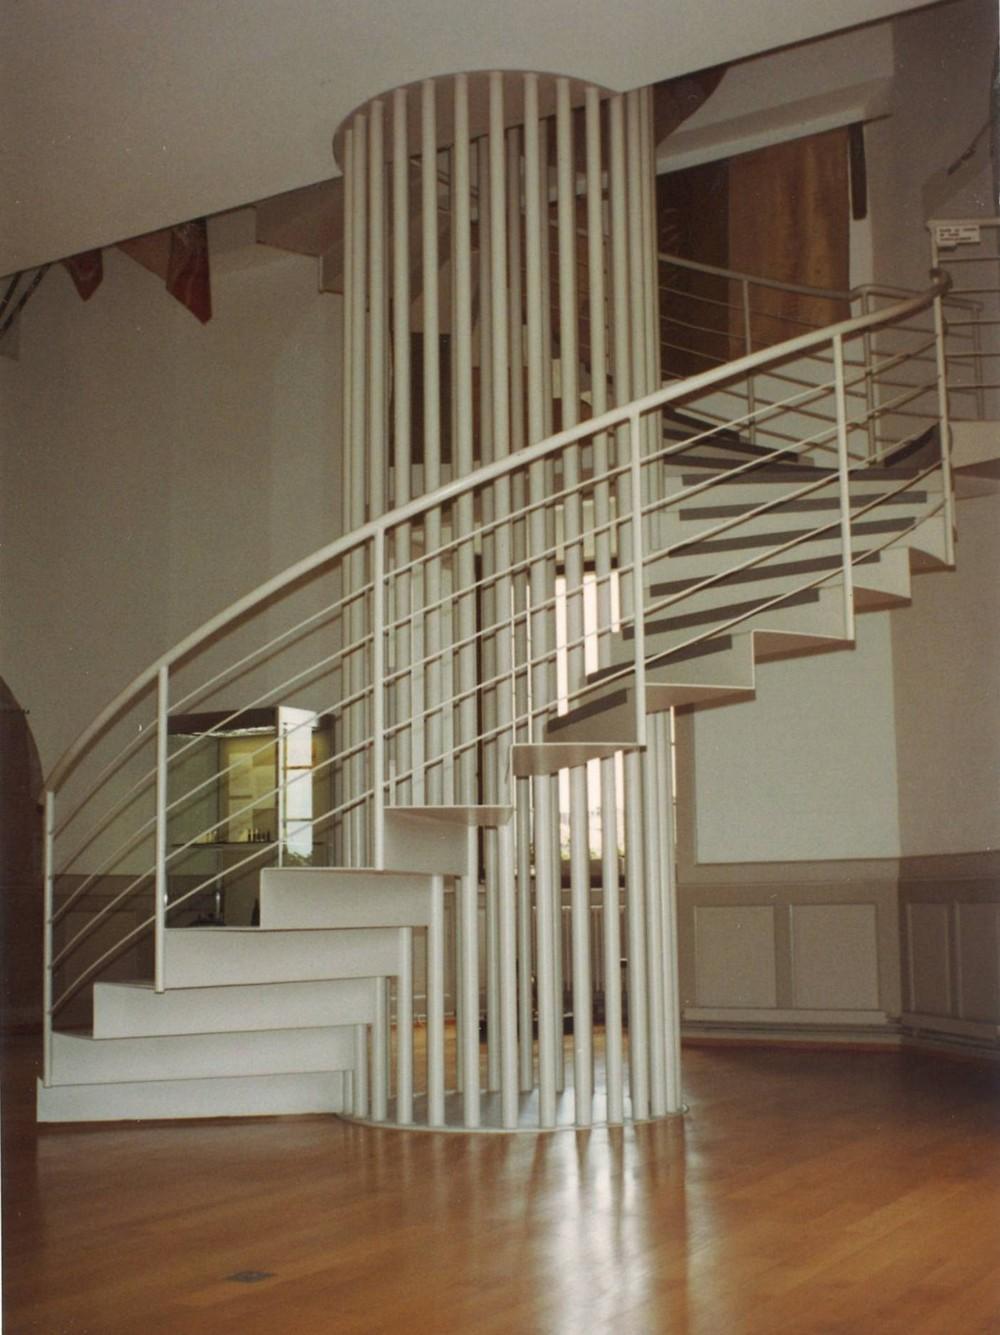 Escalier-tournant-1